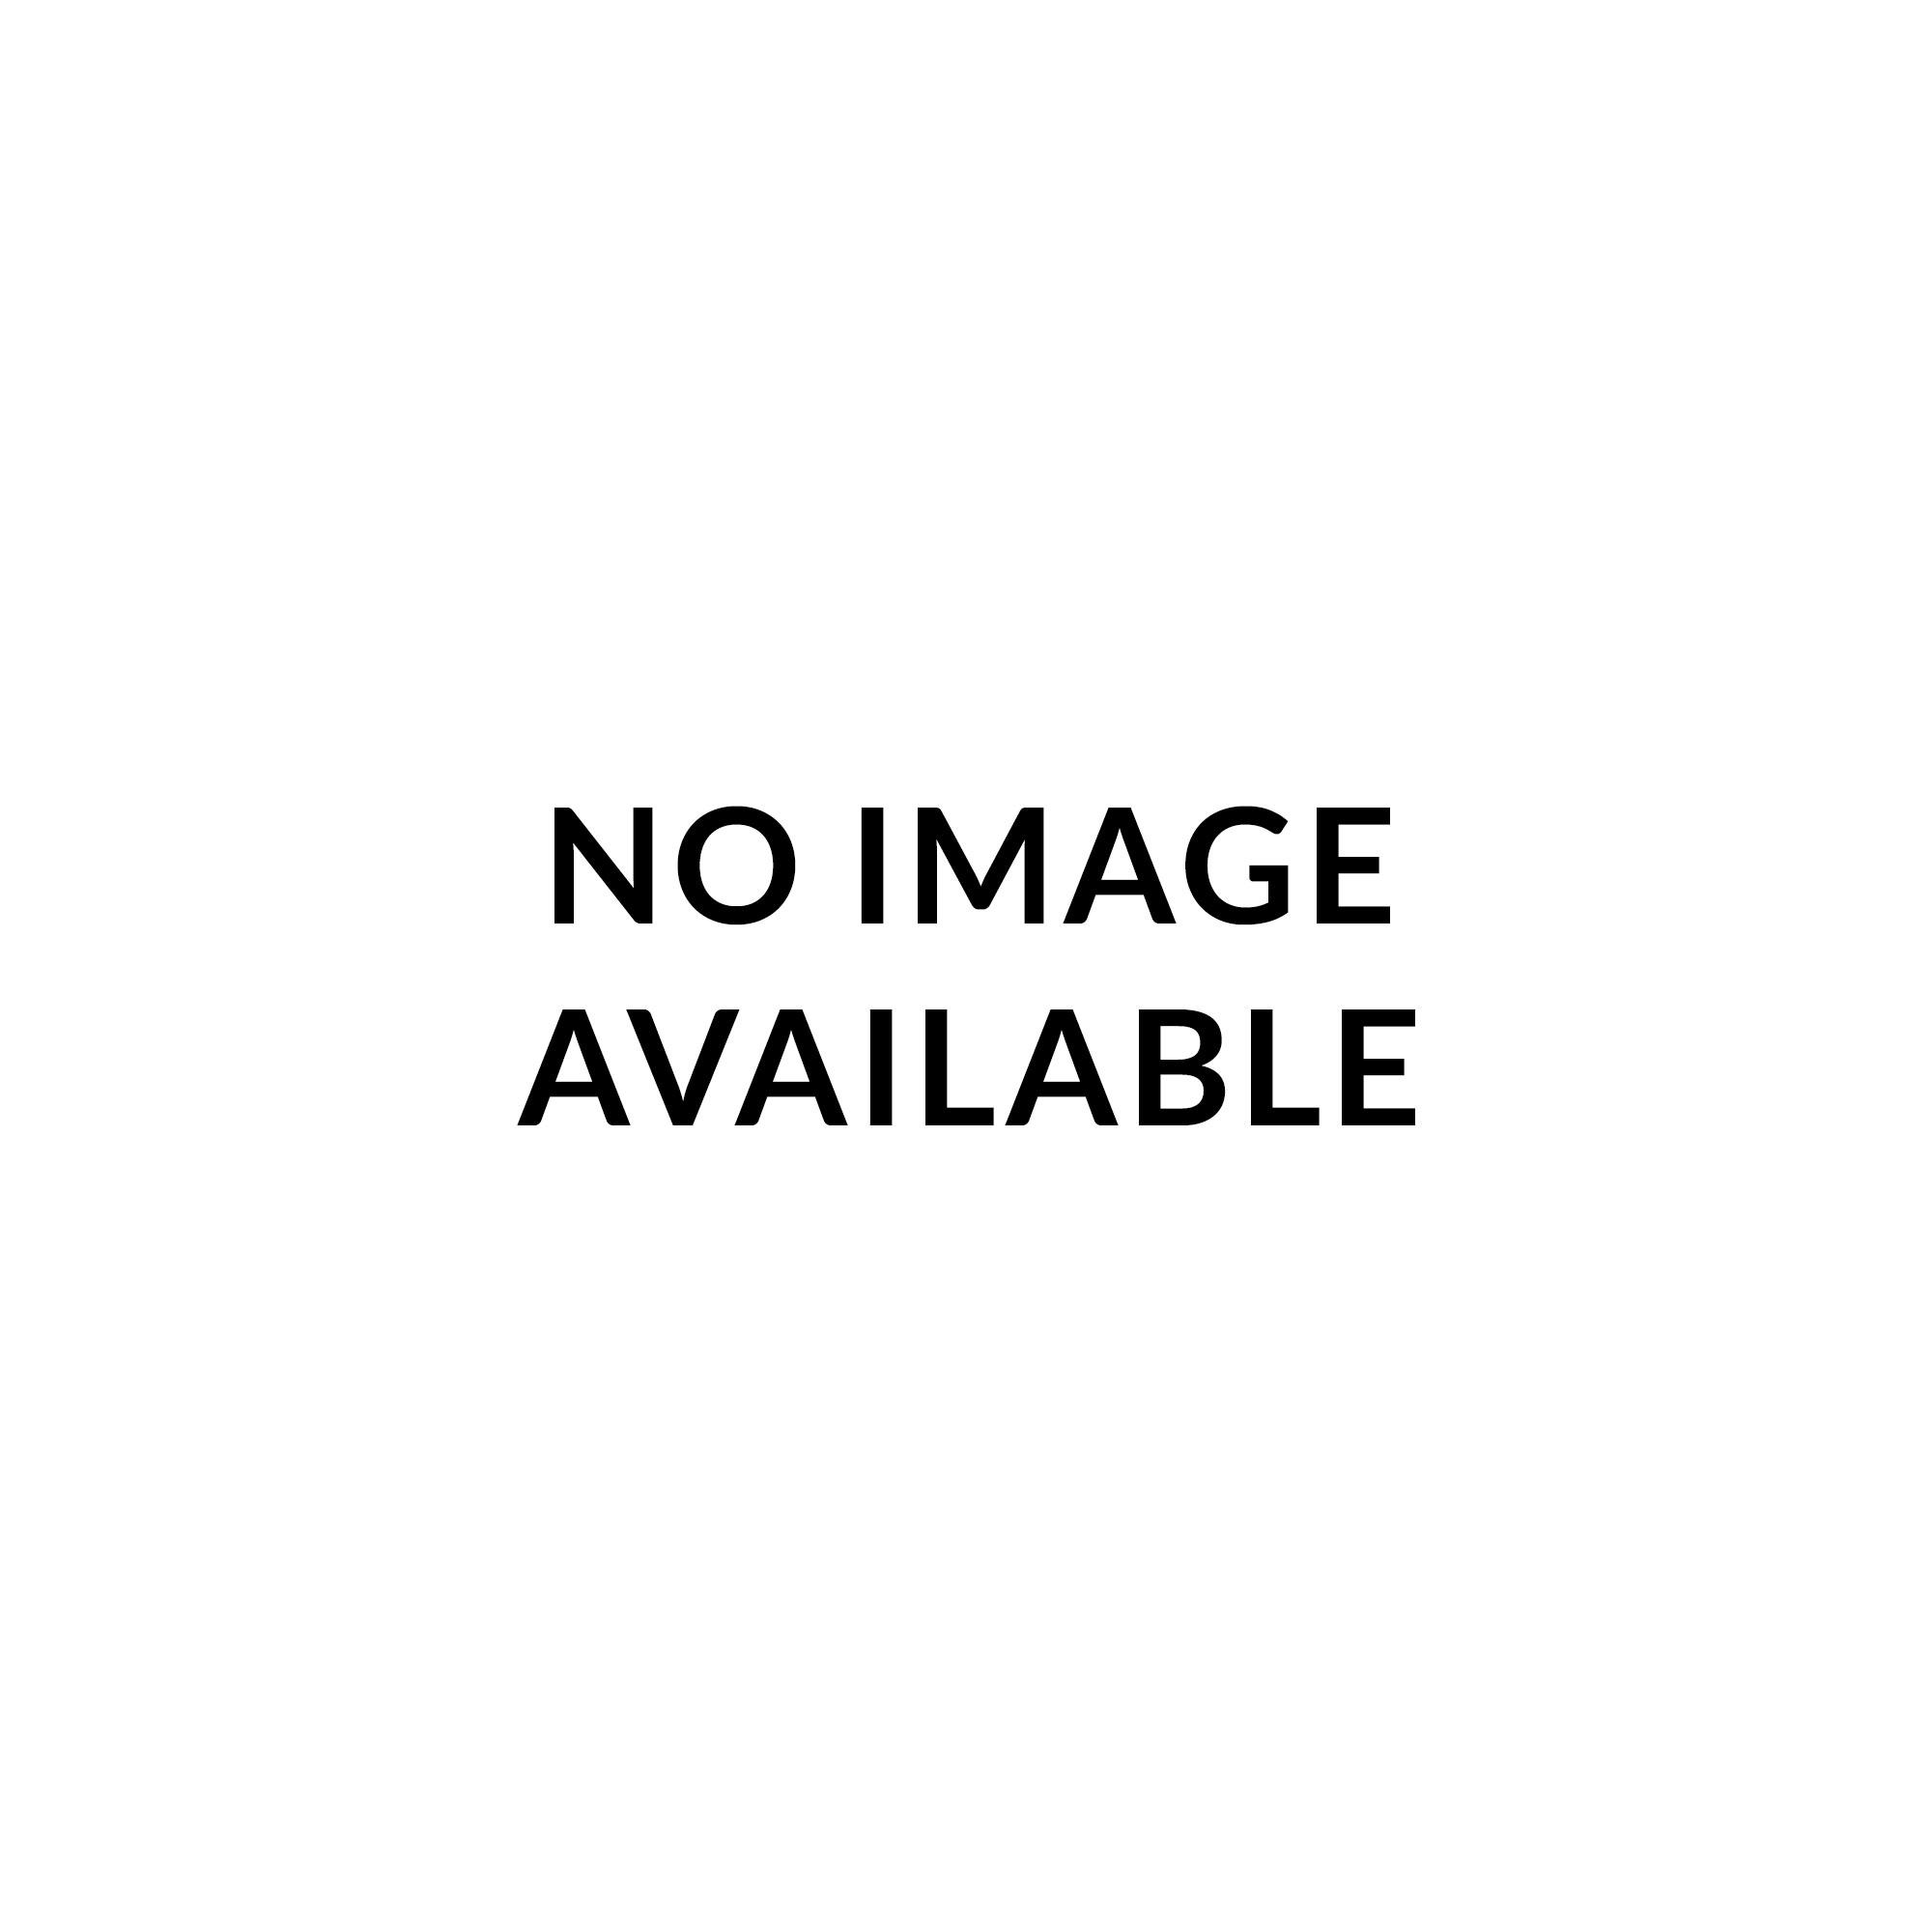 D'Addario PSB110 ProSteels XL Bass Single String .110 Long Scale